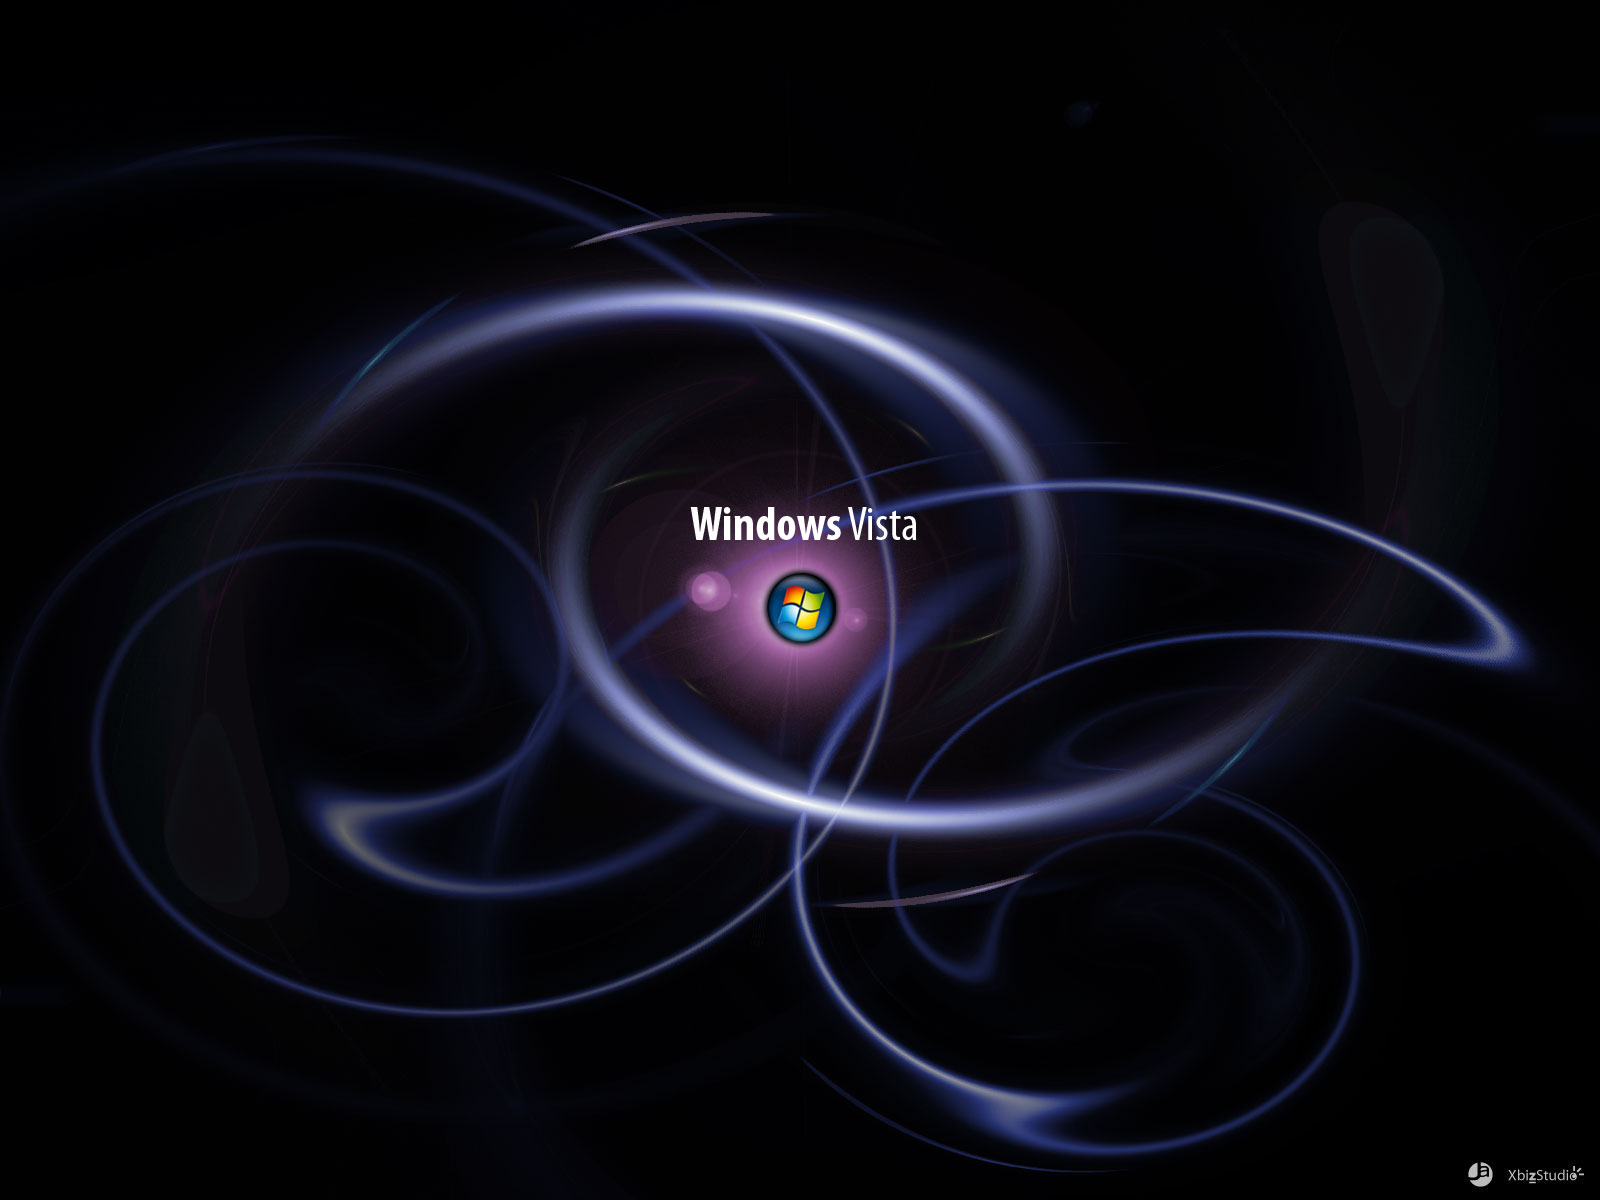 http://1.bp.blogspot.com/-1T771suRkXY/TiqIzXQo07I/AAAAAAAACd8/s7AbfS0eSos/s1600/windows+xp+darklin+wallpapers3.jpg